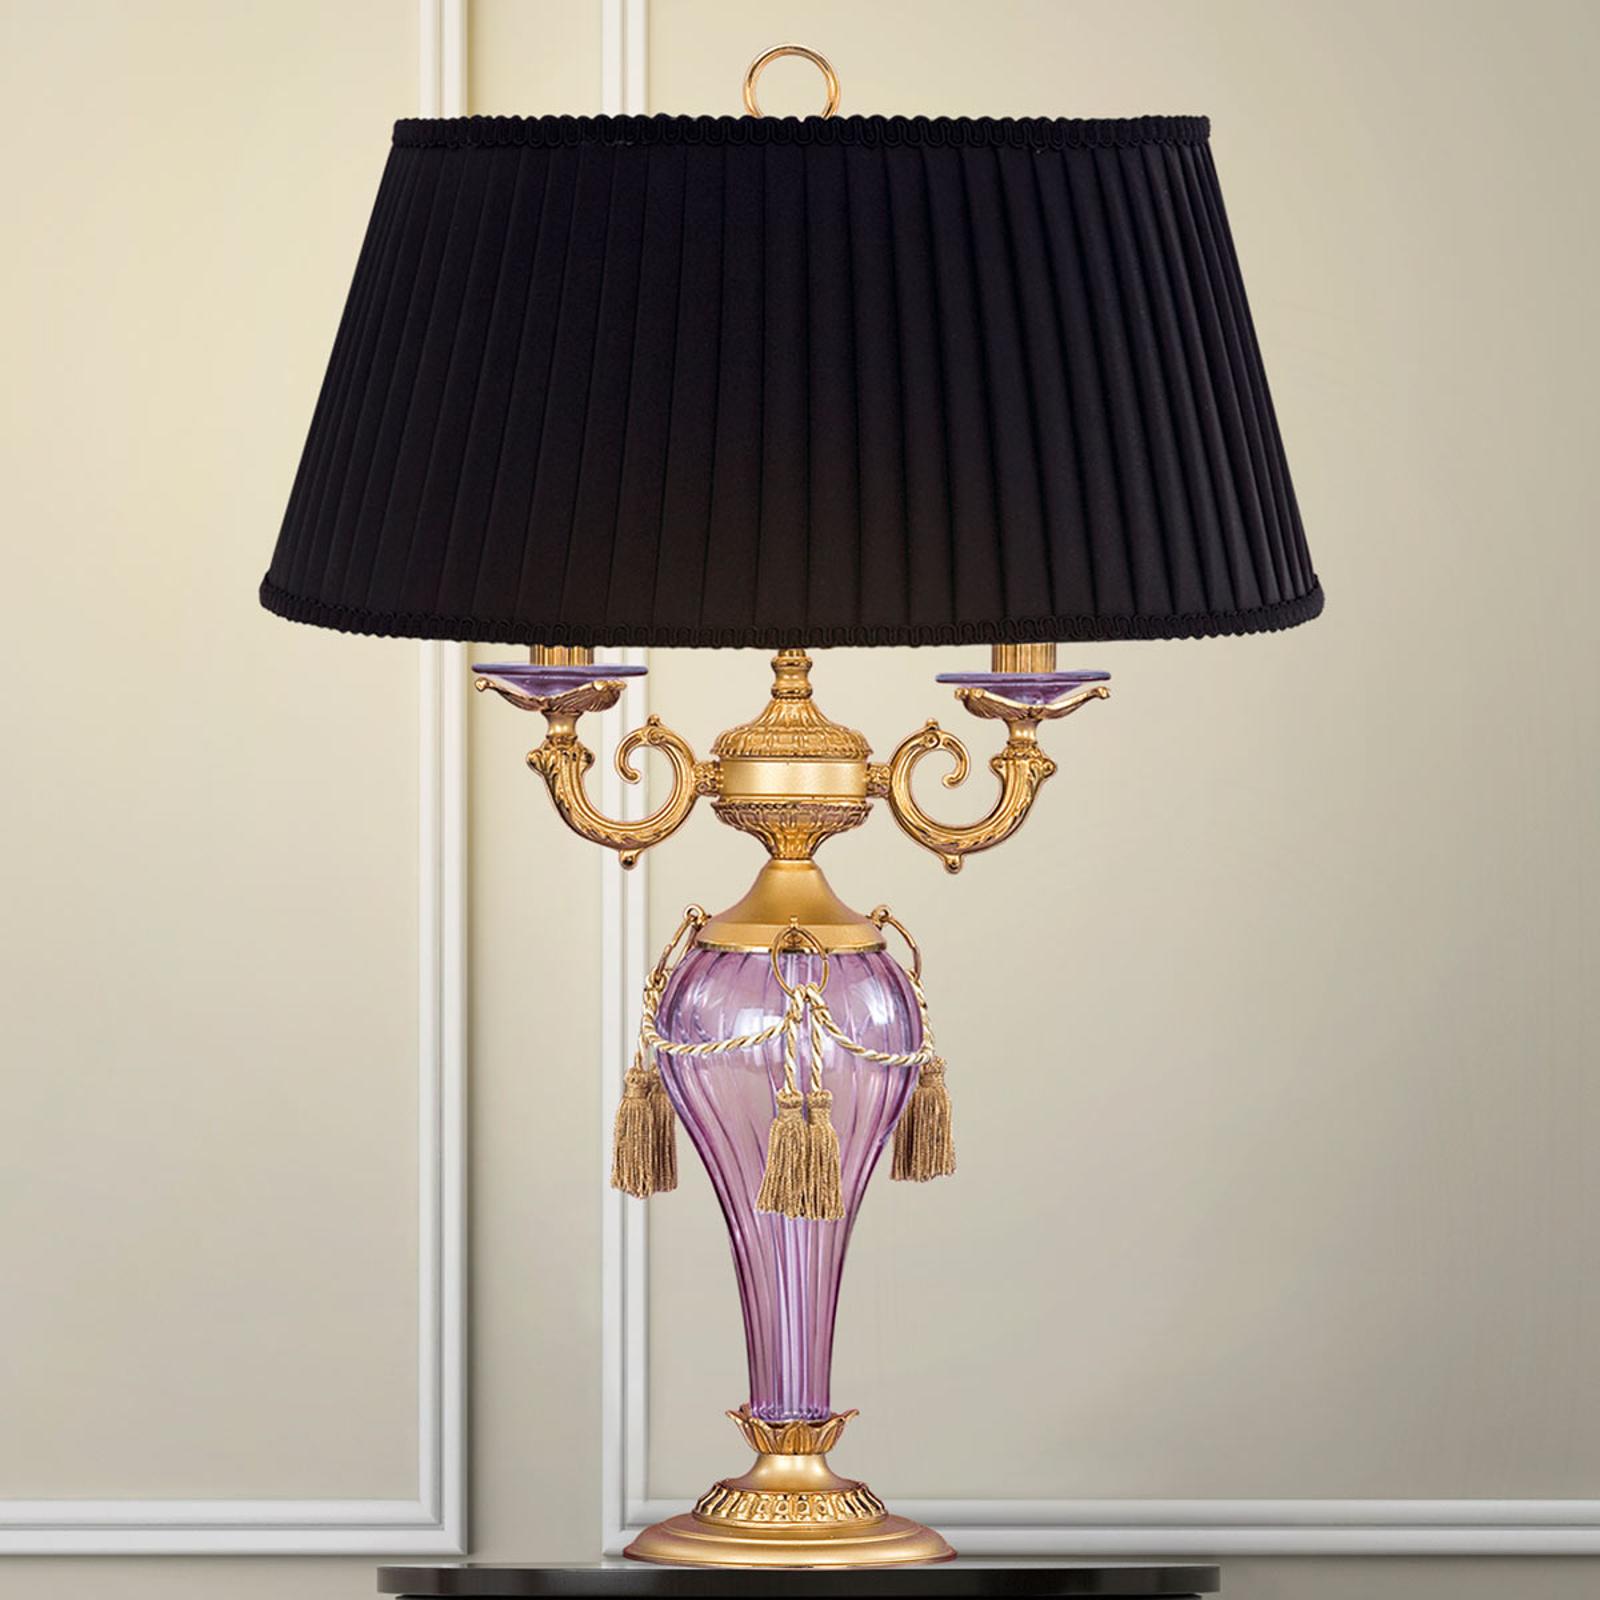 Bordlampe Hero 72 cm sort, mat guld, klar violet